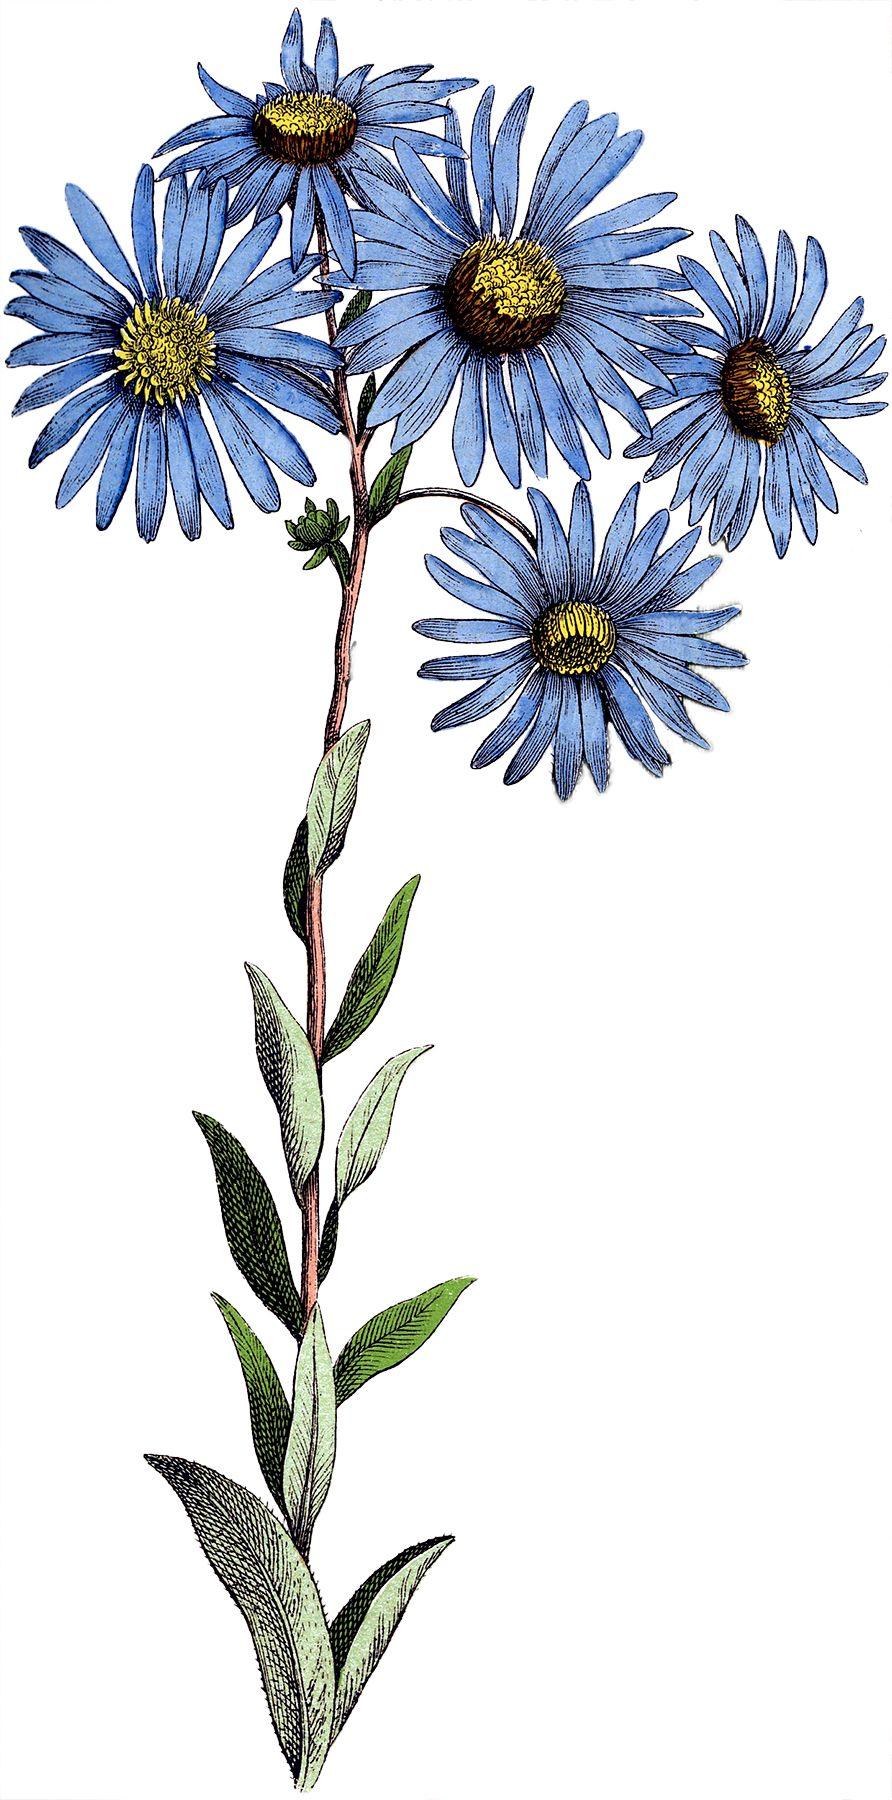 Blue daisy flowers image botanical graphics fairy aster and the graphics fairy asters daisy flowersvintage izmirmasajfo Image collections